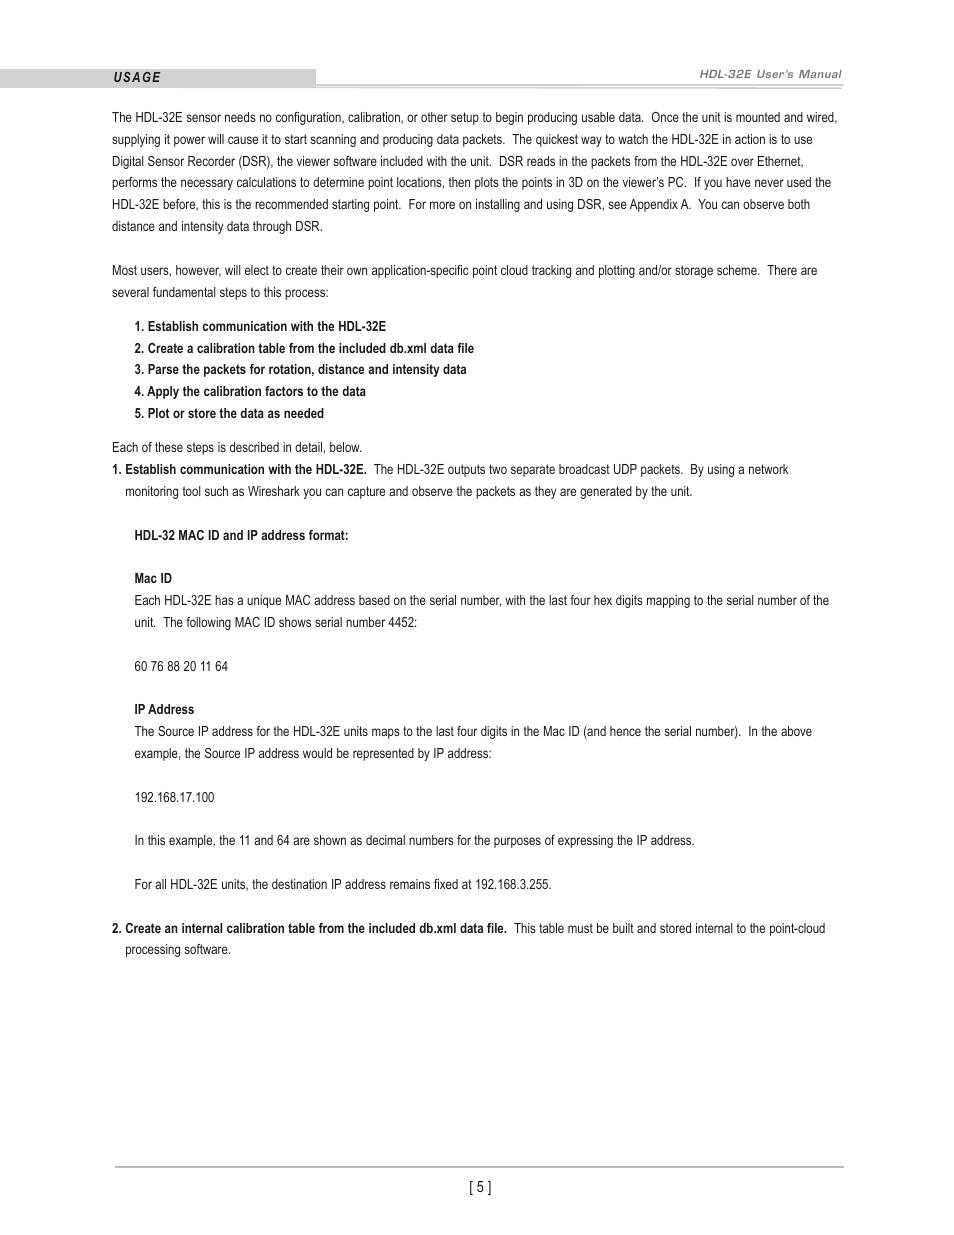 Velodyne Acoustics LIDAR HDL-32E User Manual | Page 8 / 28